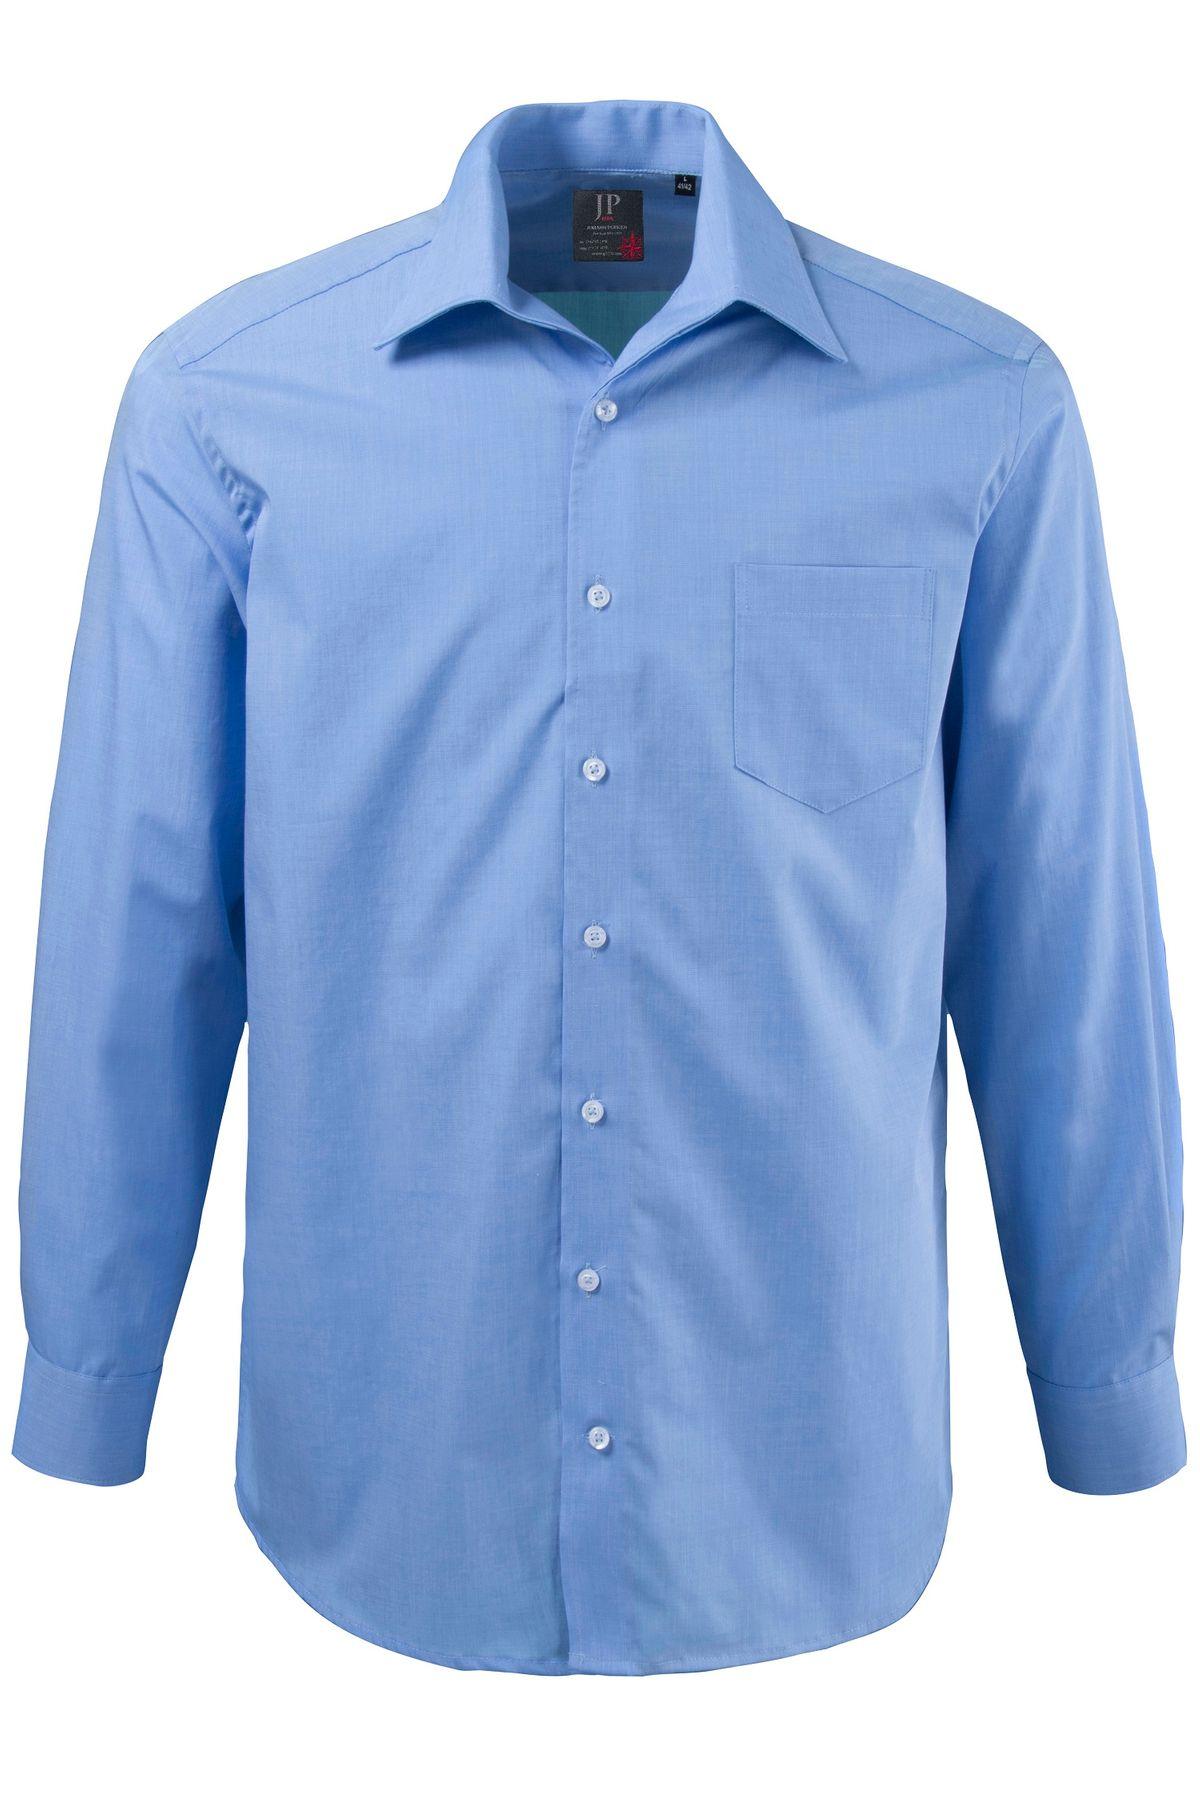 J. Popken - Comfort Fit -  Herren Hemd mit Variokragen in Hellblau bis Größe 7XL (Artikel: 70363272) – Bild 1